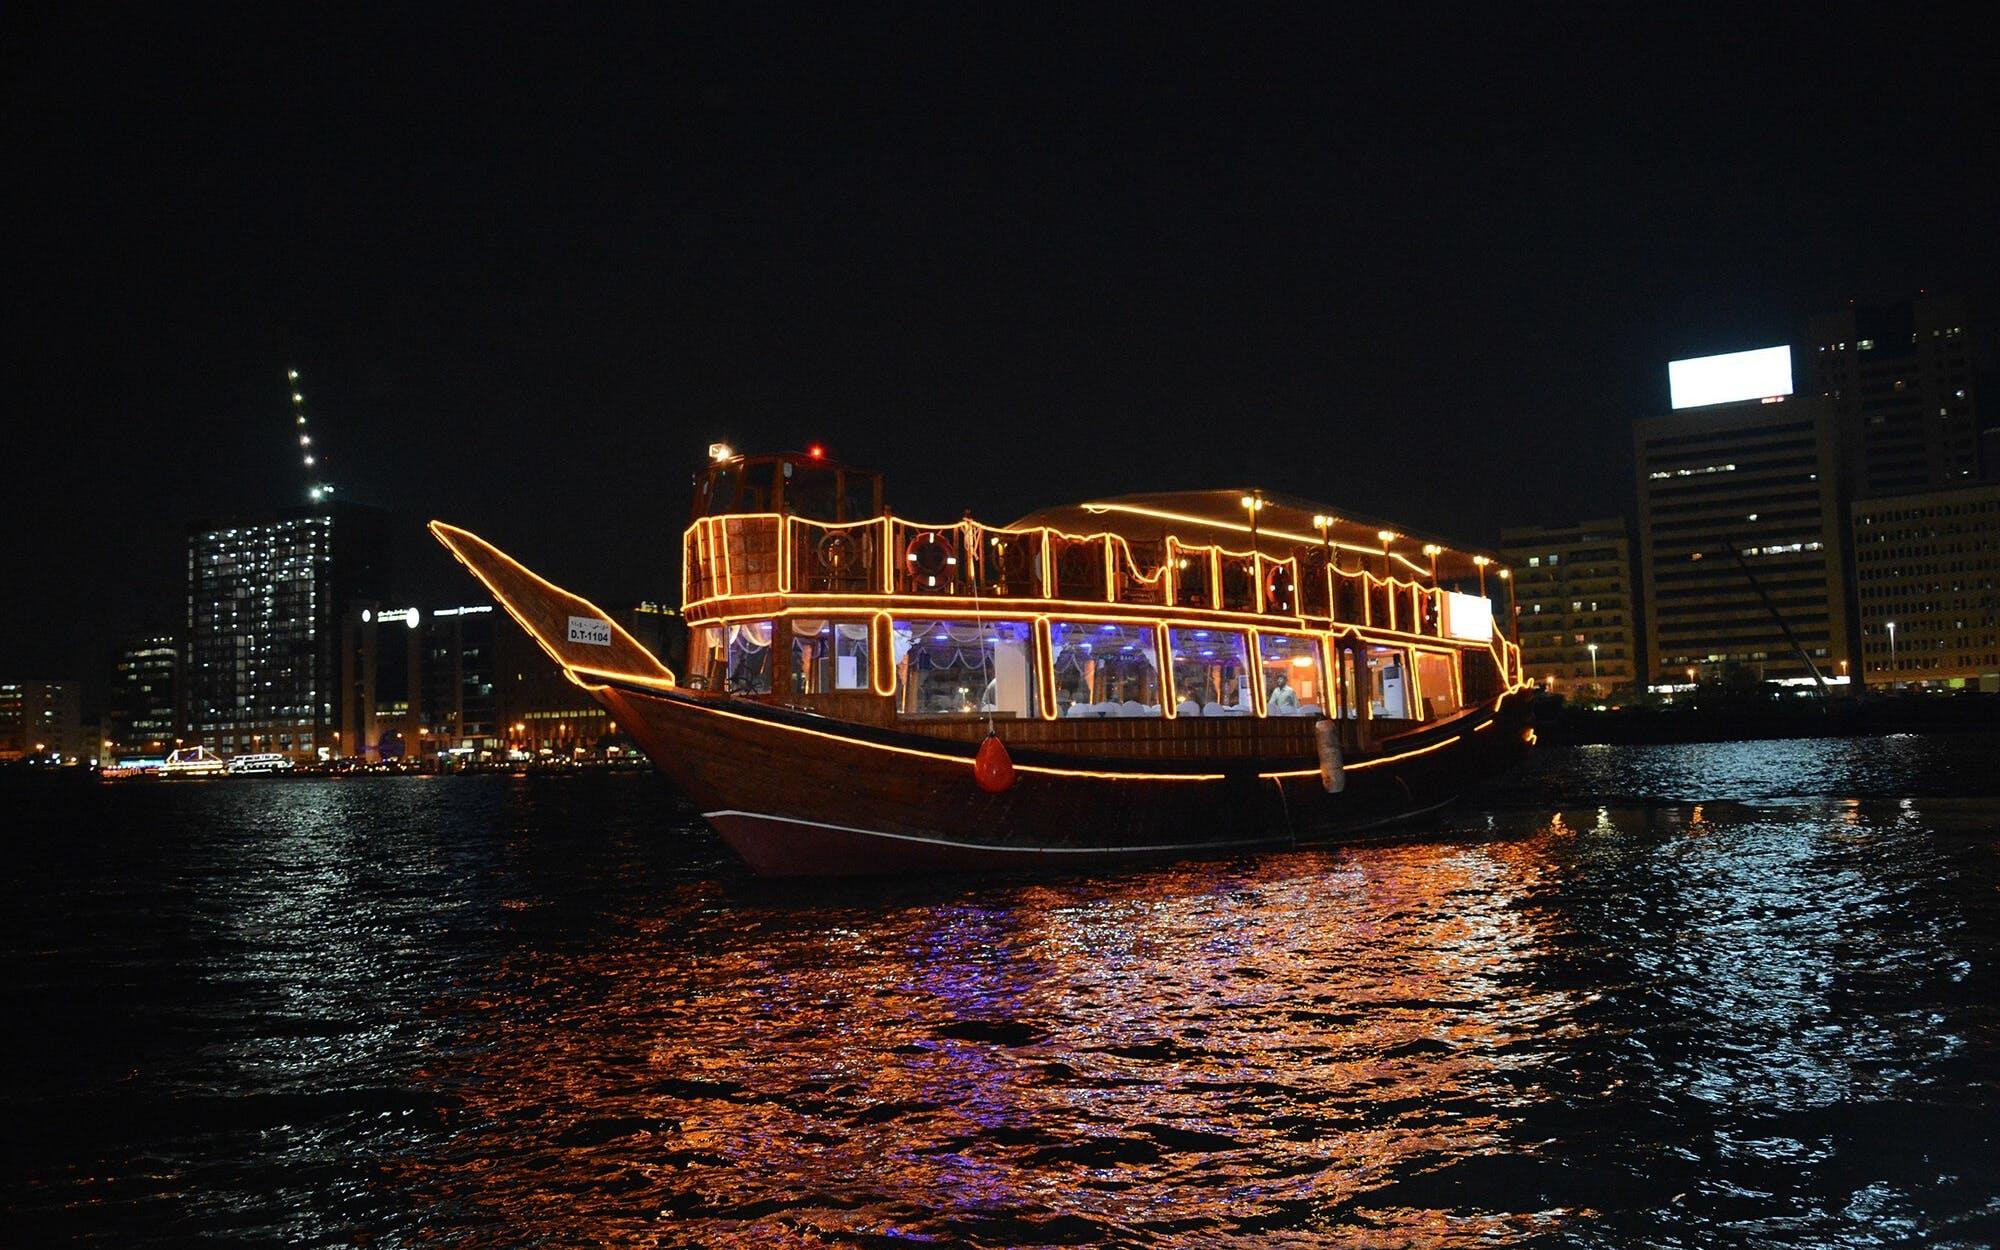 Best dhow cruise in Dubai - Marina dinner cruise